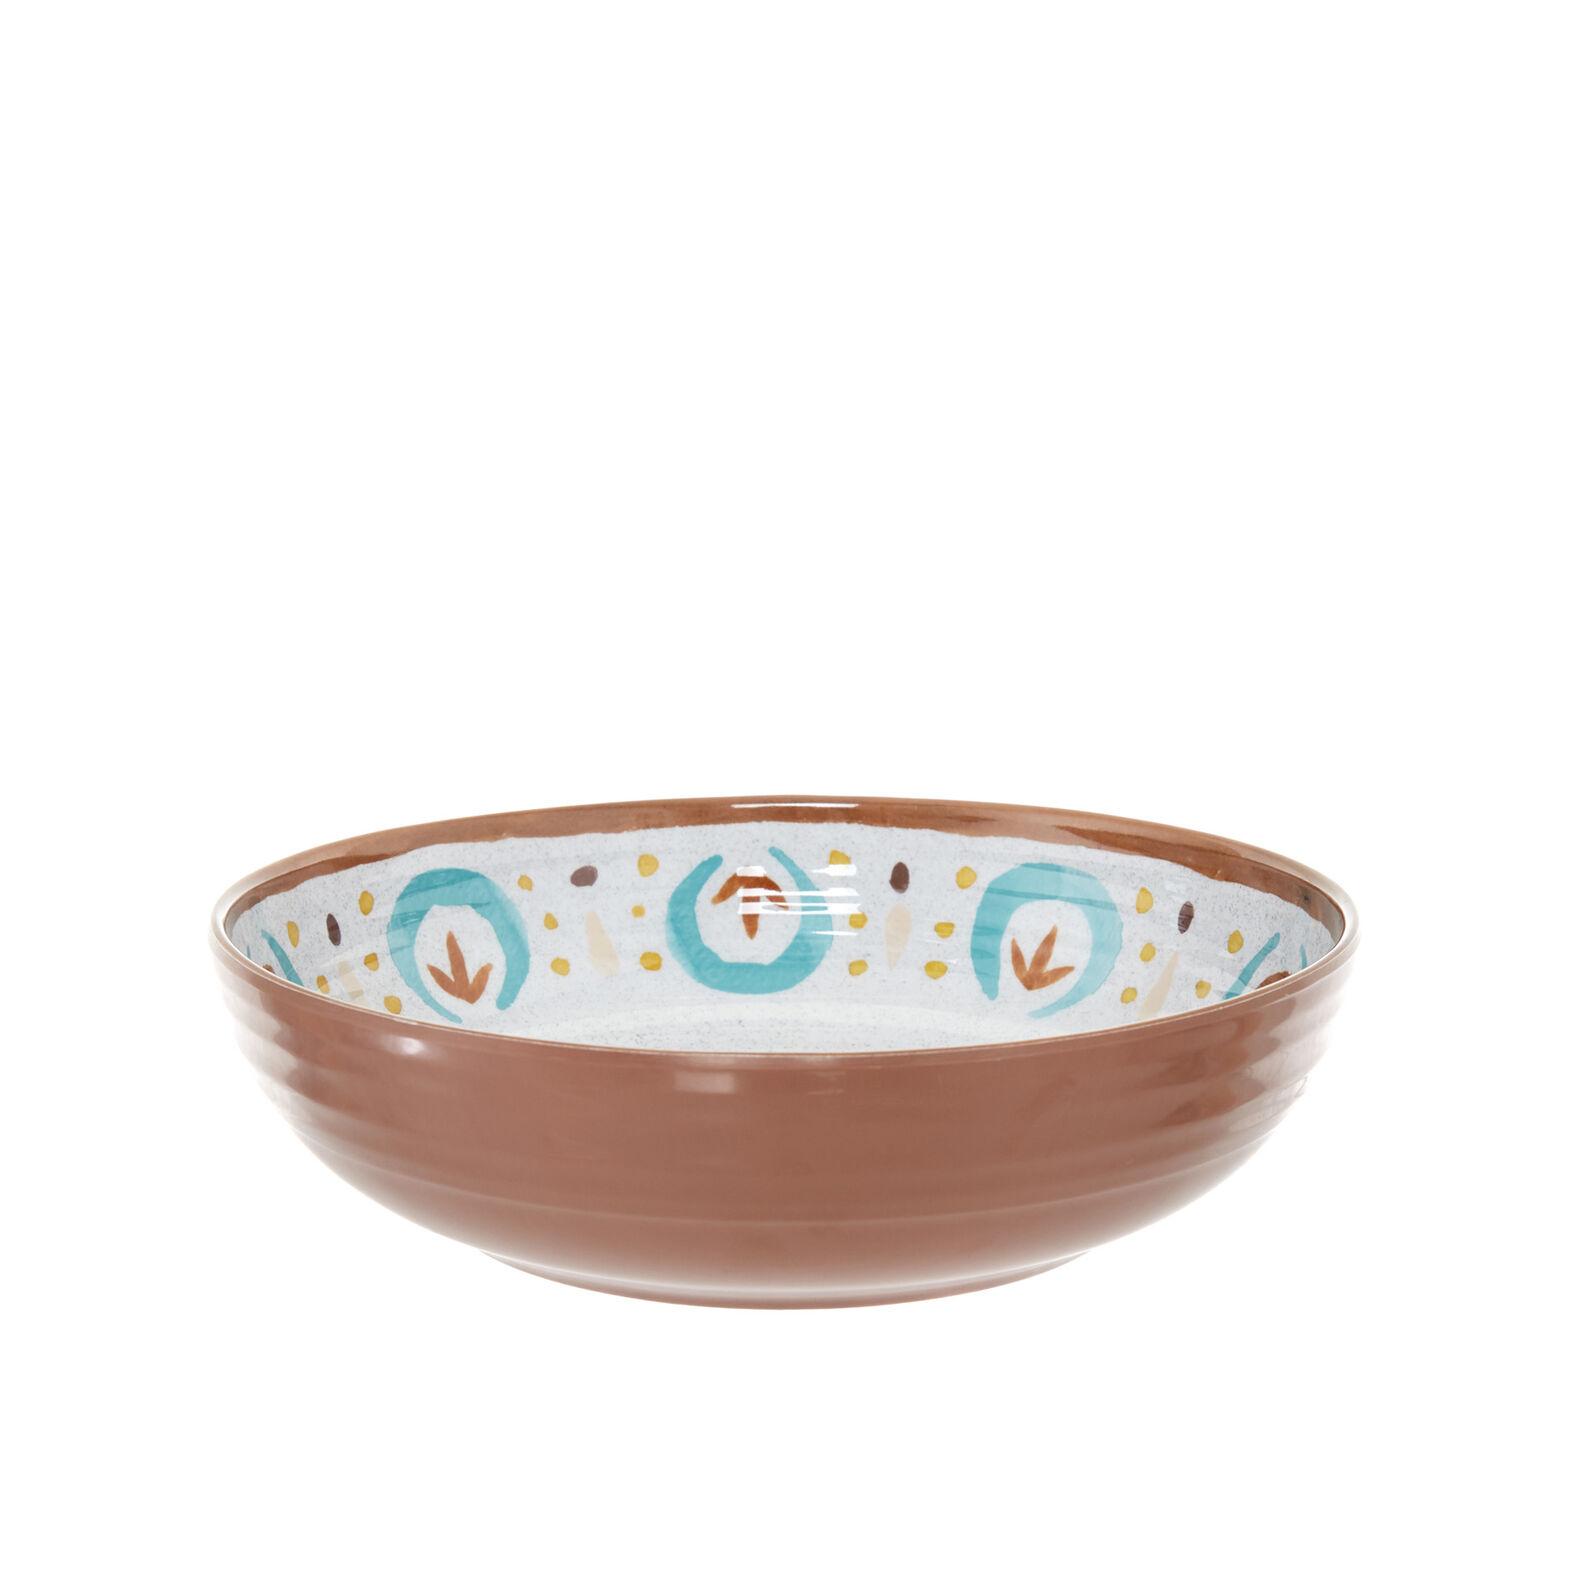 Folk melamine soup bowl